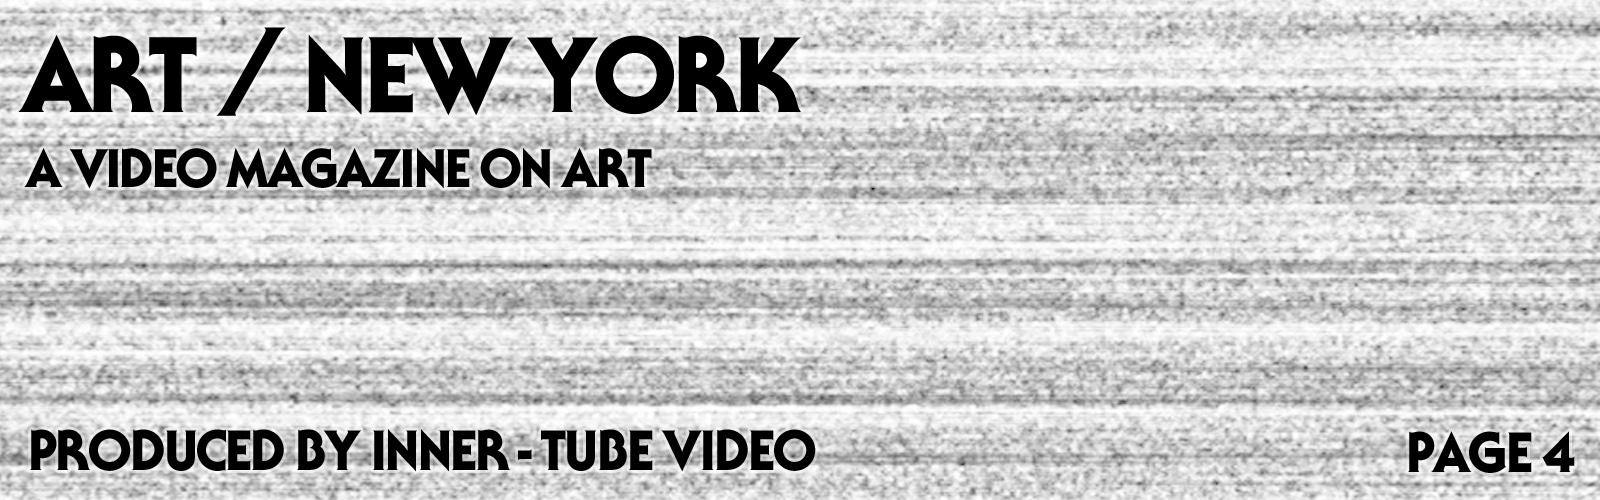 art-newyork-cover-page4.jpg